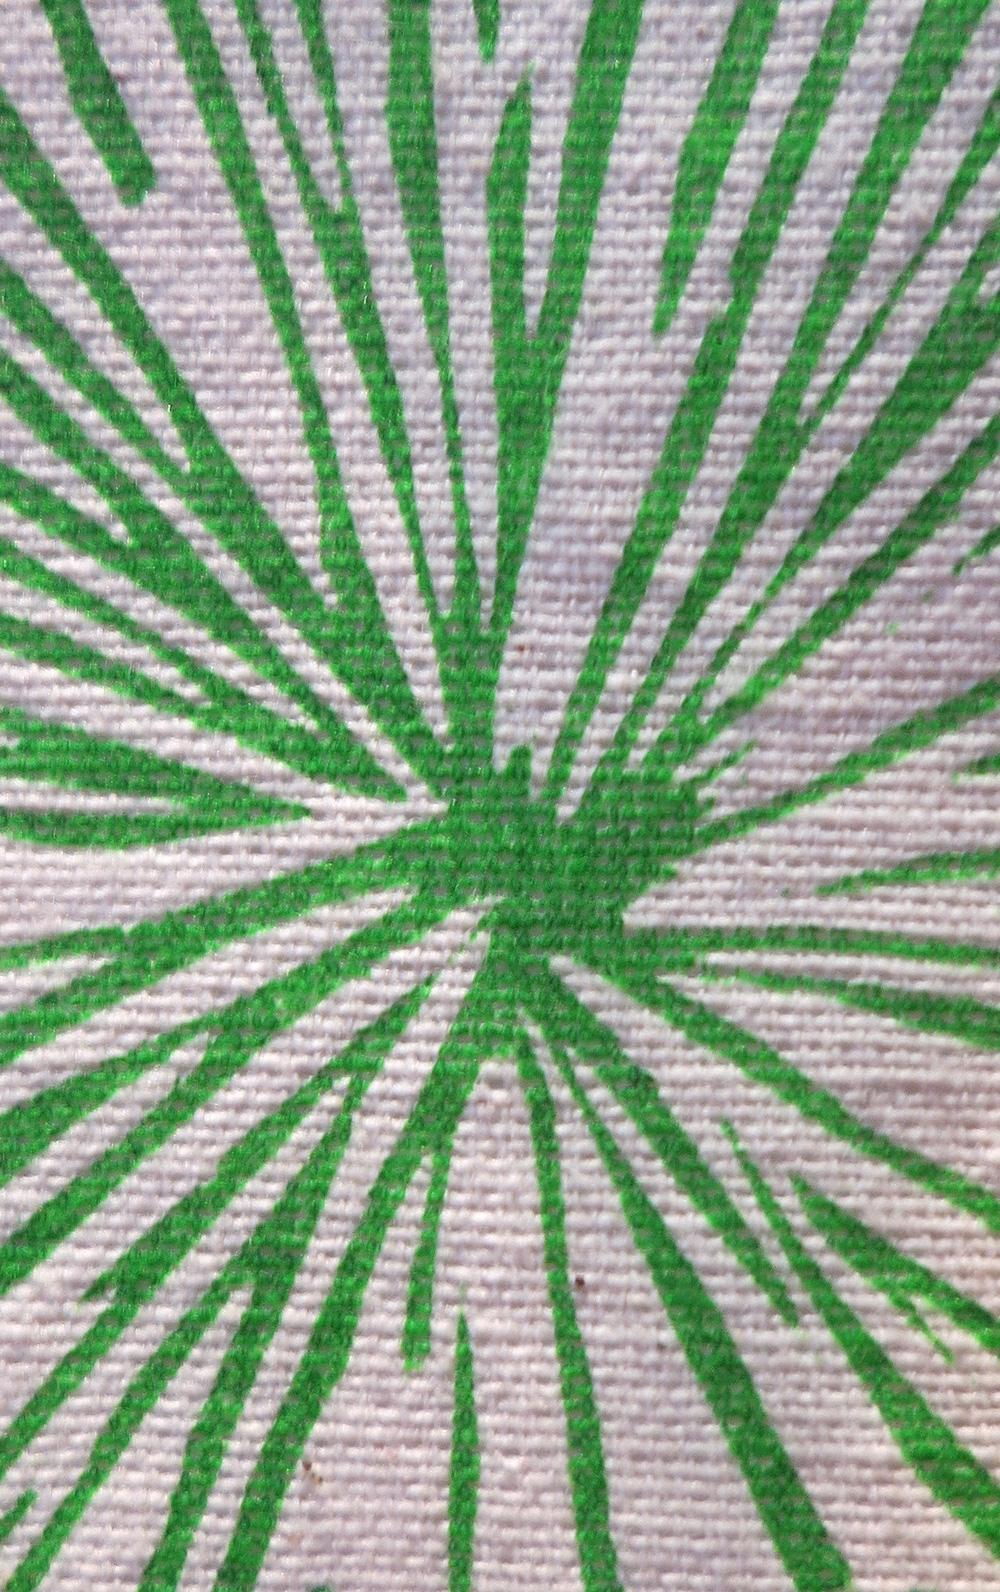 l-xilopress-xilografia-ilustracion-fotopolimeros-grabado-taller-letra-por-letra-papel-principal-letterpress-imprenta-tipografica-1.jpg